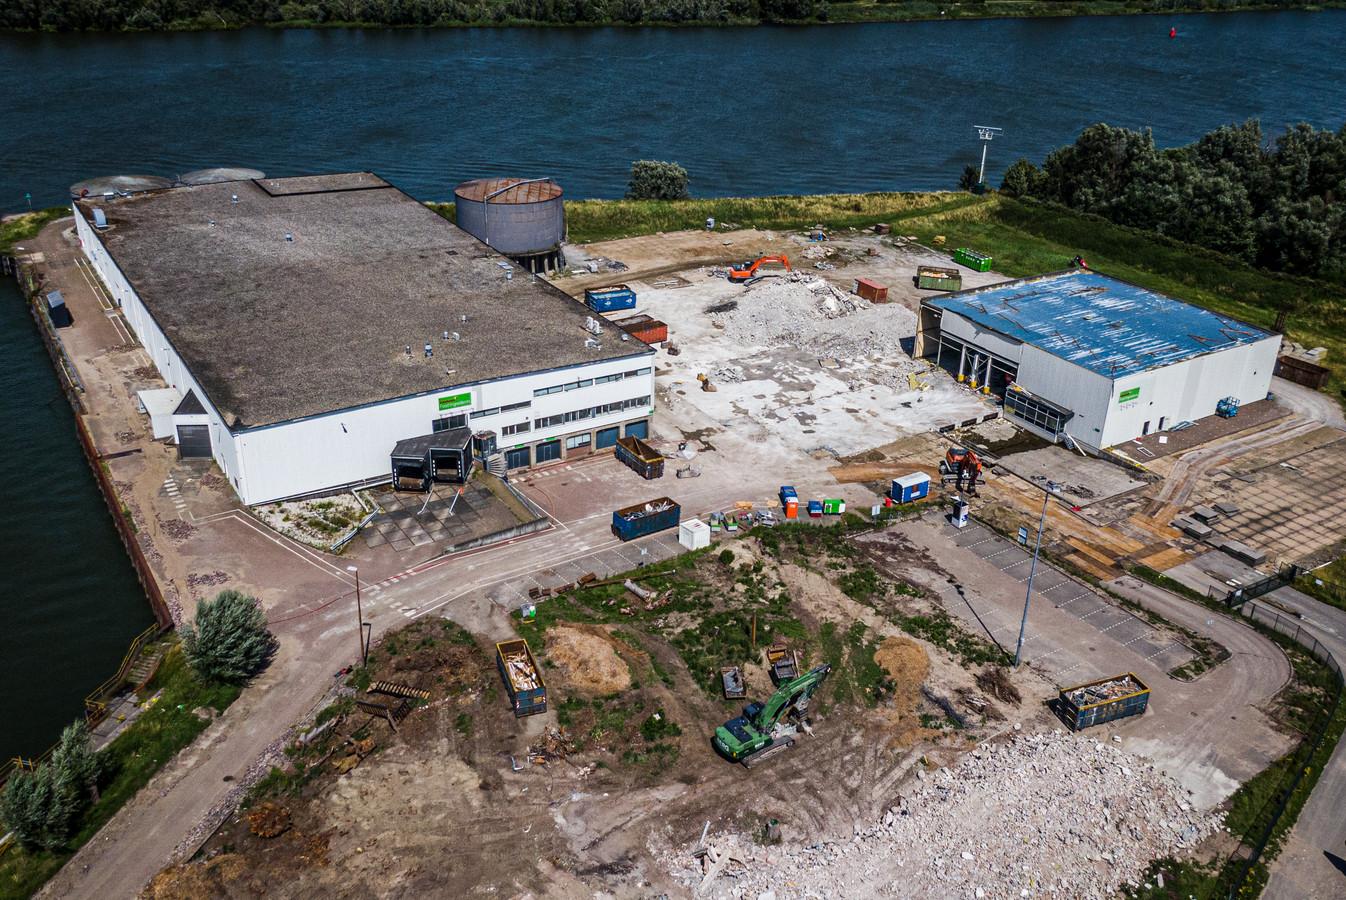 De sloop van de Intertastefabriek in Puttershoek is in volle gang.